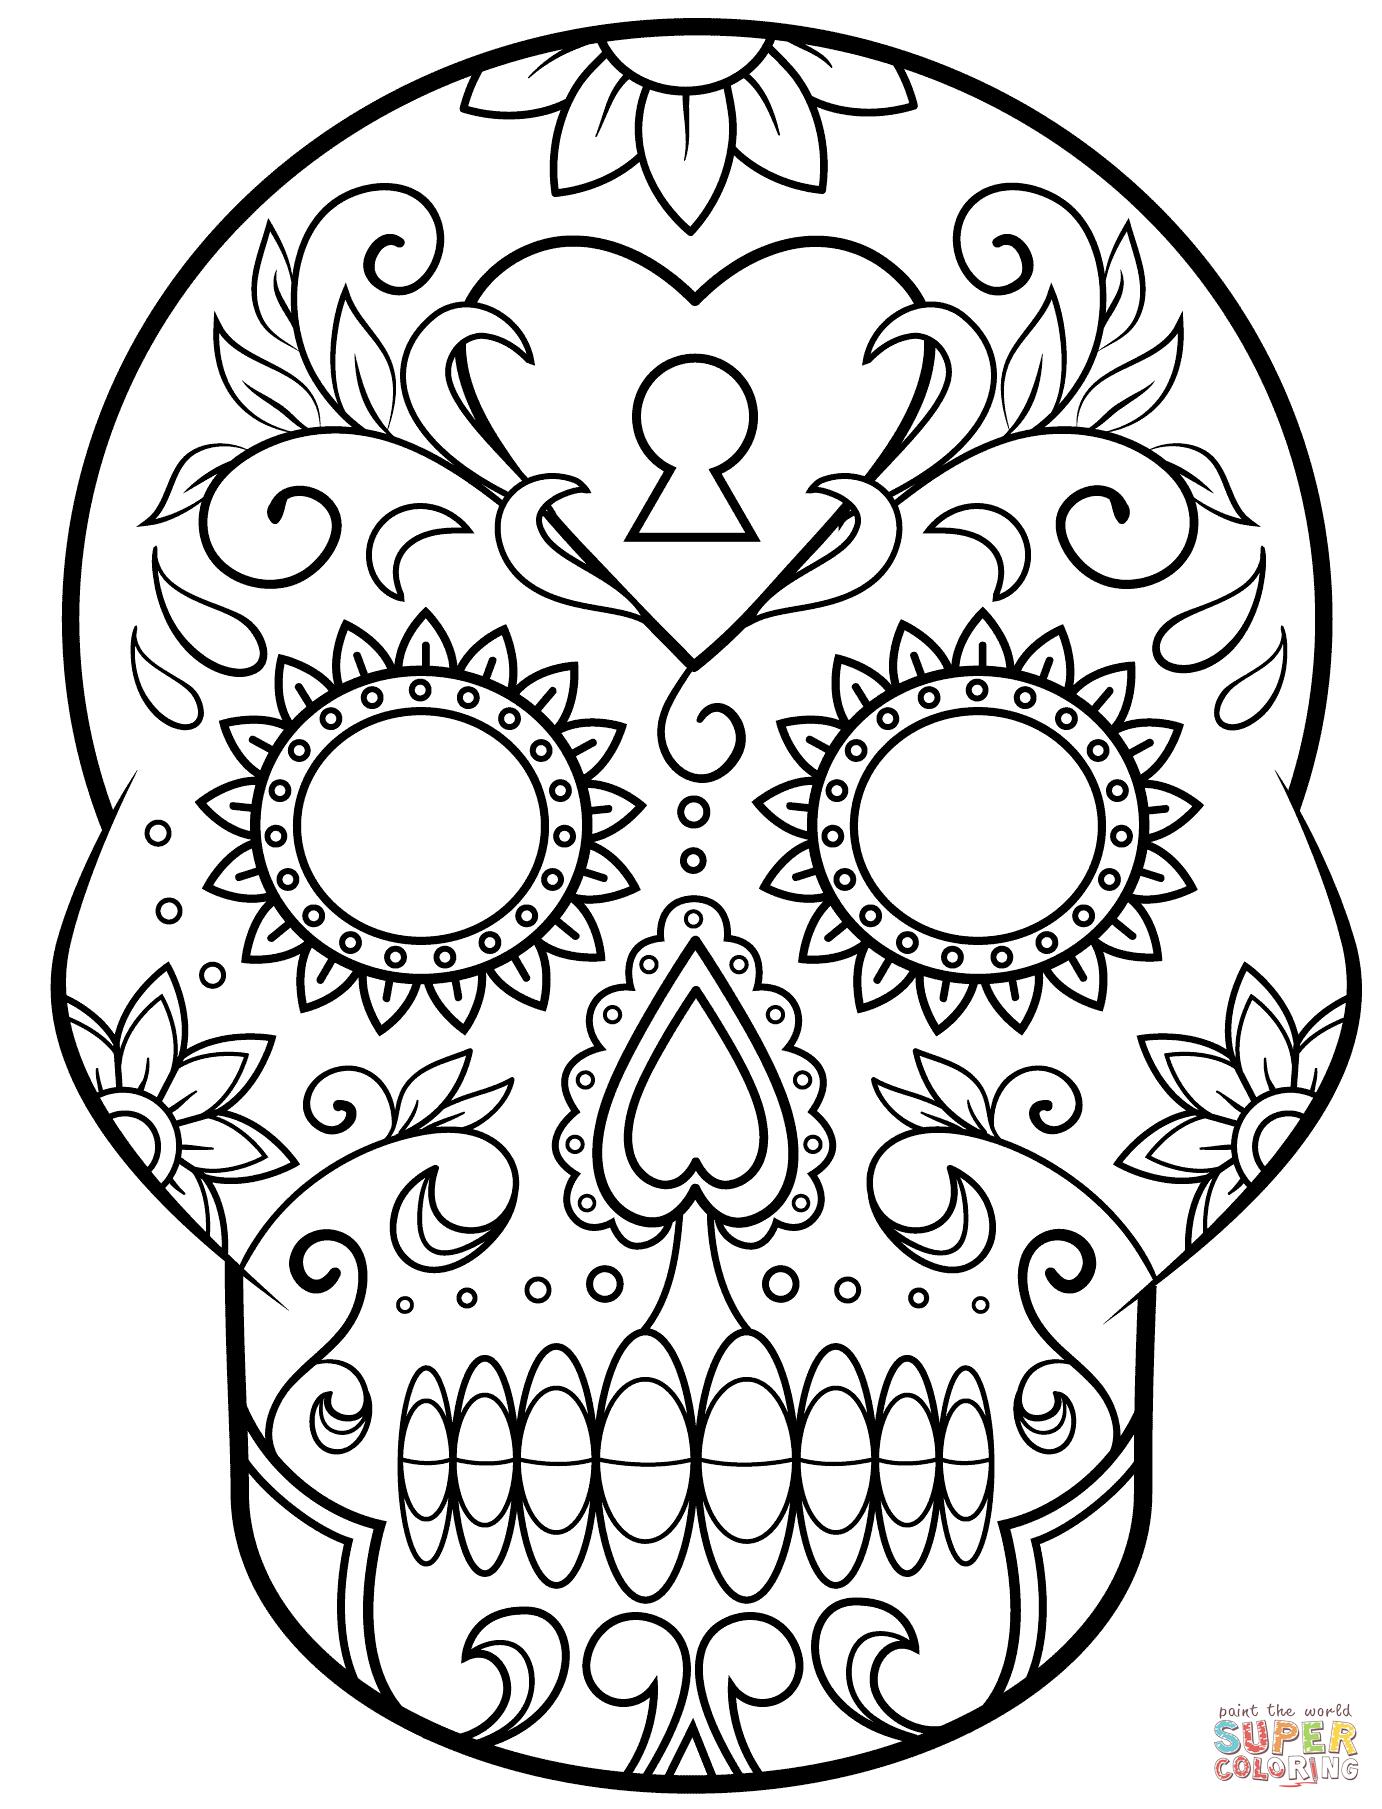 Drawn skull coloring page Skull the Day  Sugar